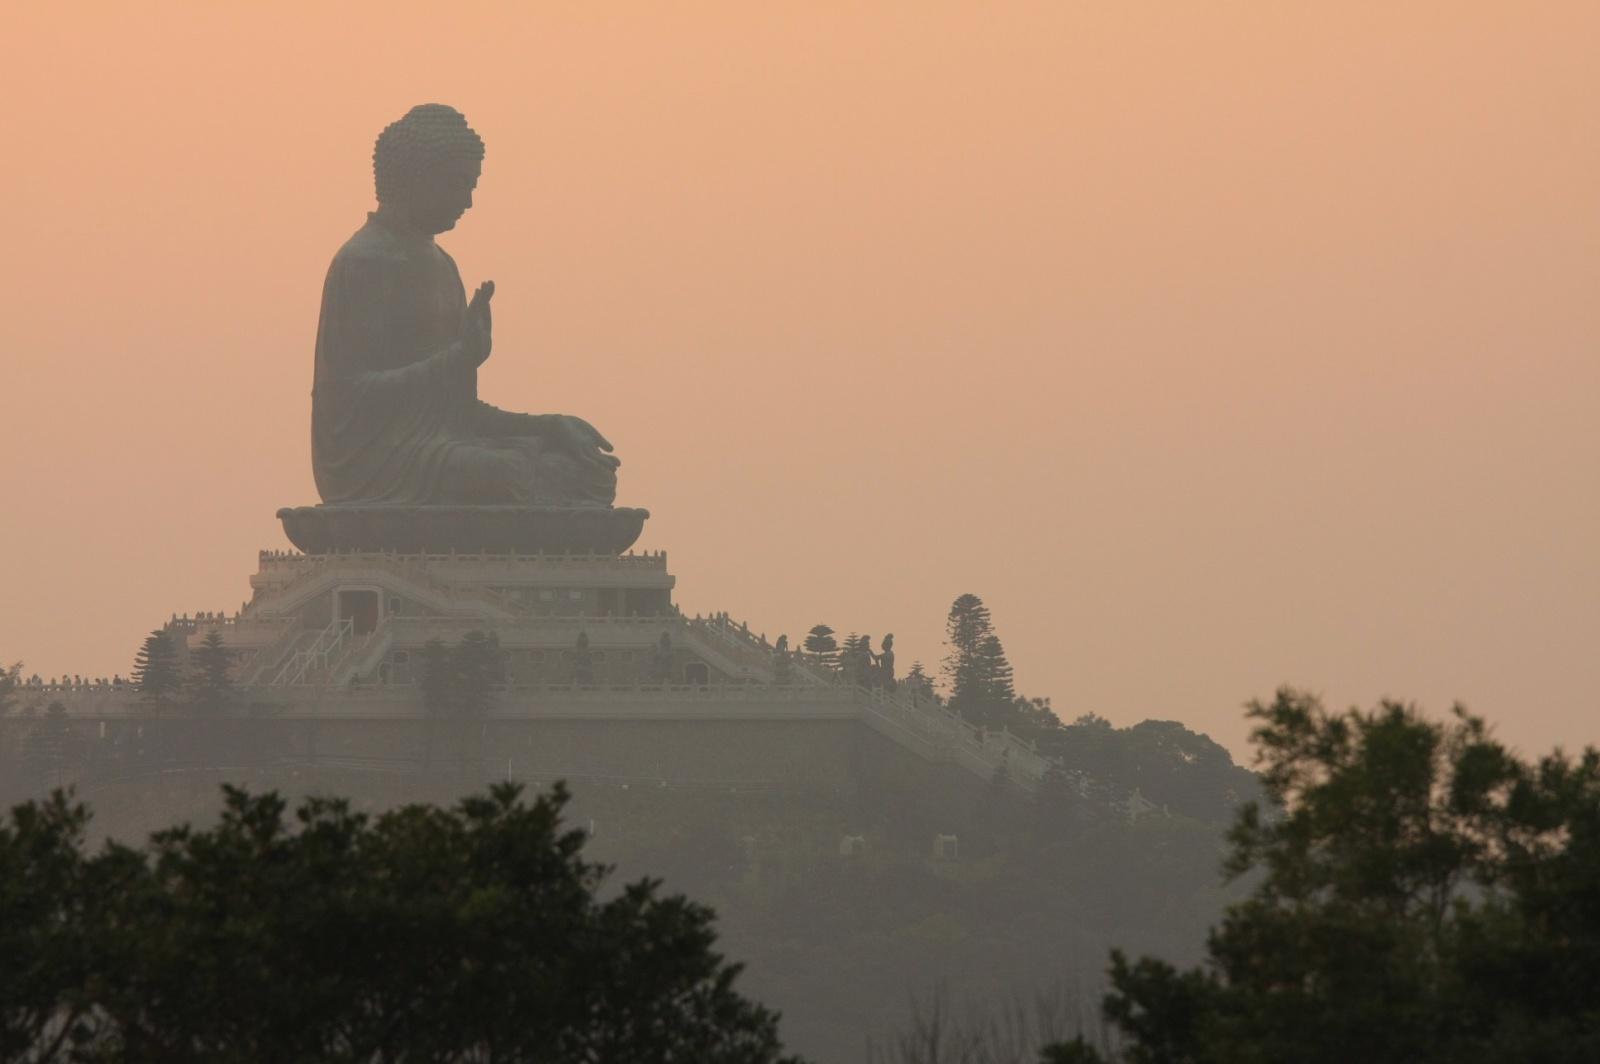 The Big Buddha from the Lantau trail